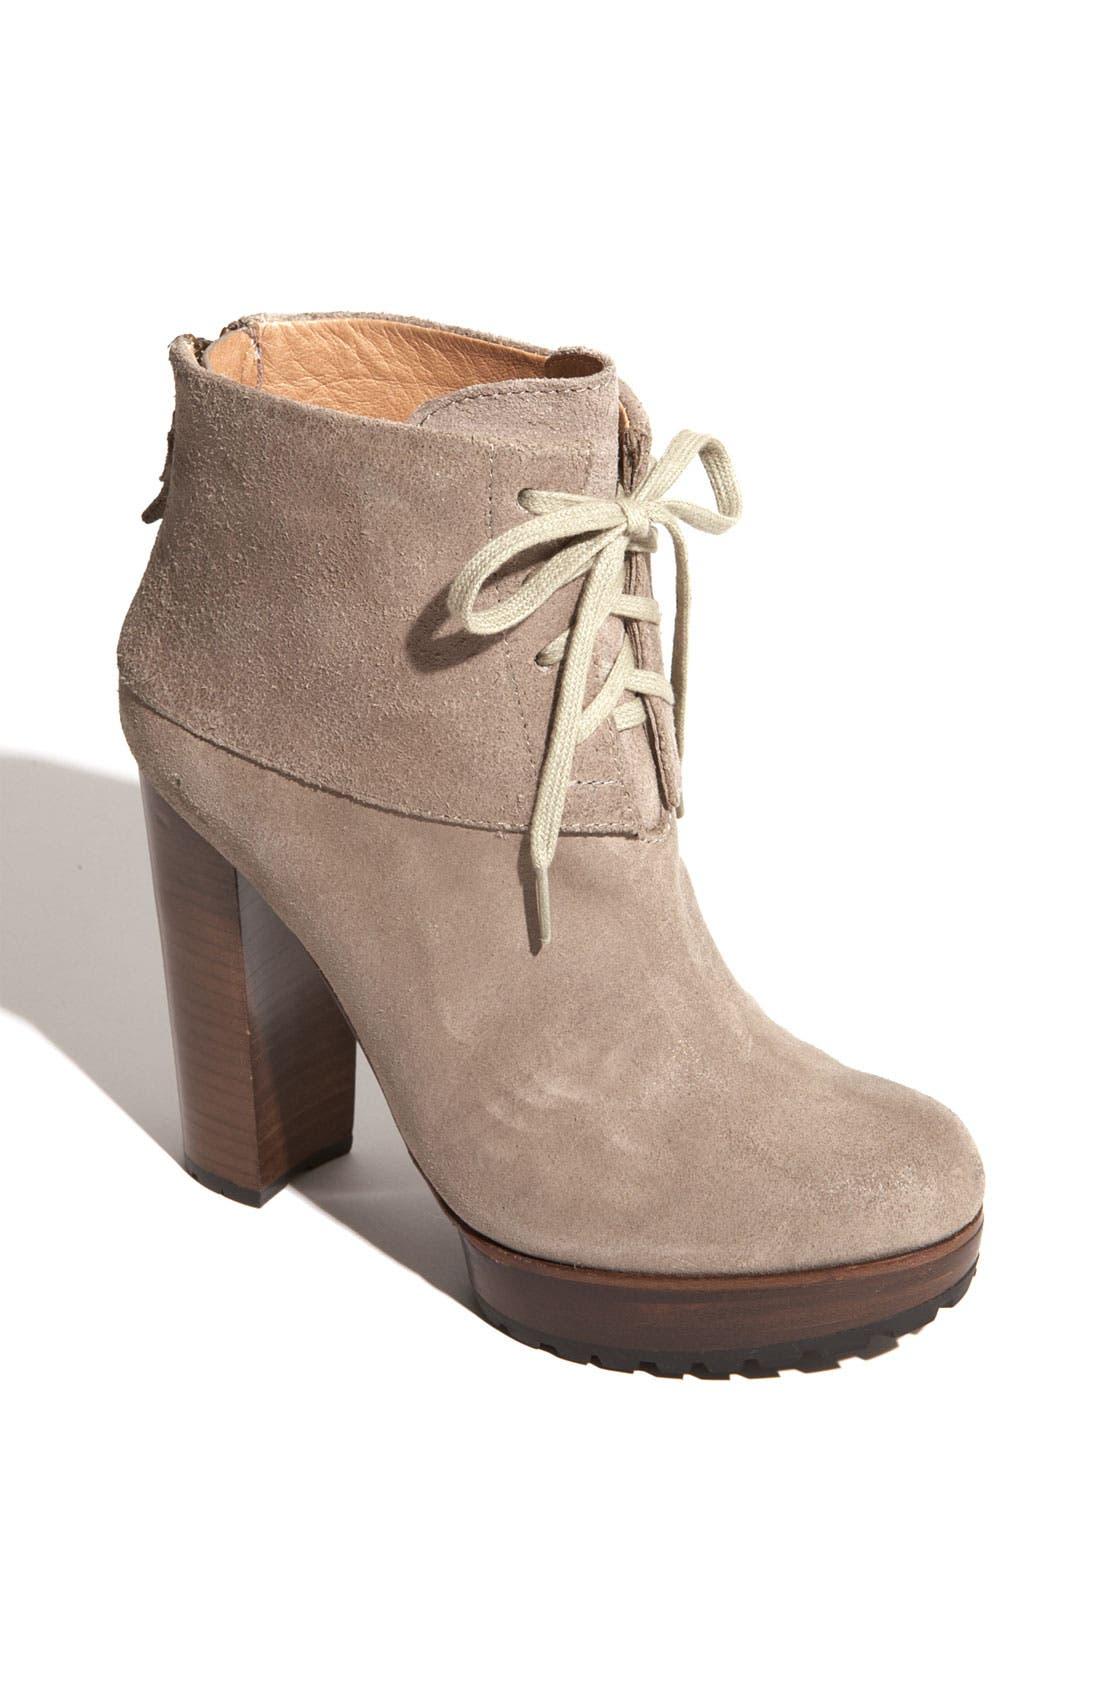 Alternate Image 1 Selected - Modern Vintage 'Jenie' Boot